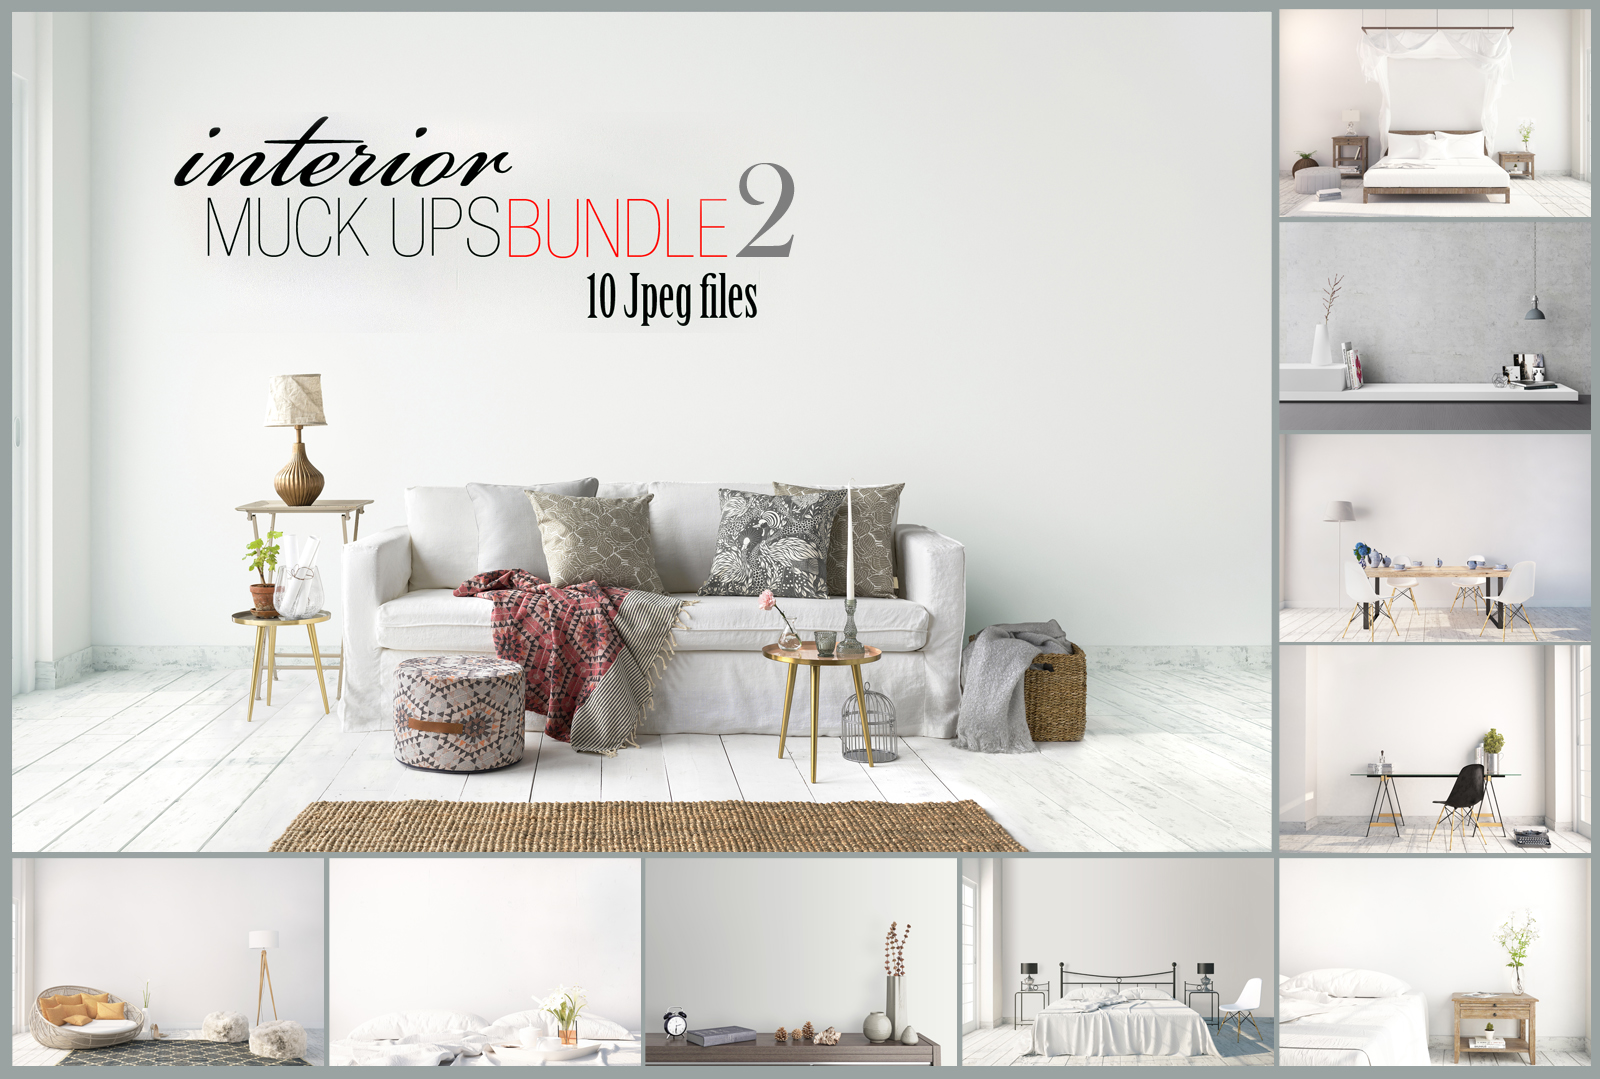 interior mockups bundle, stock photo example image 1